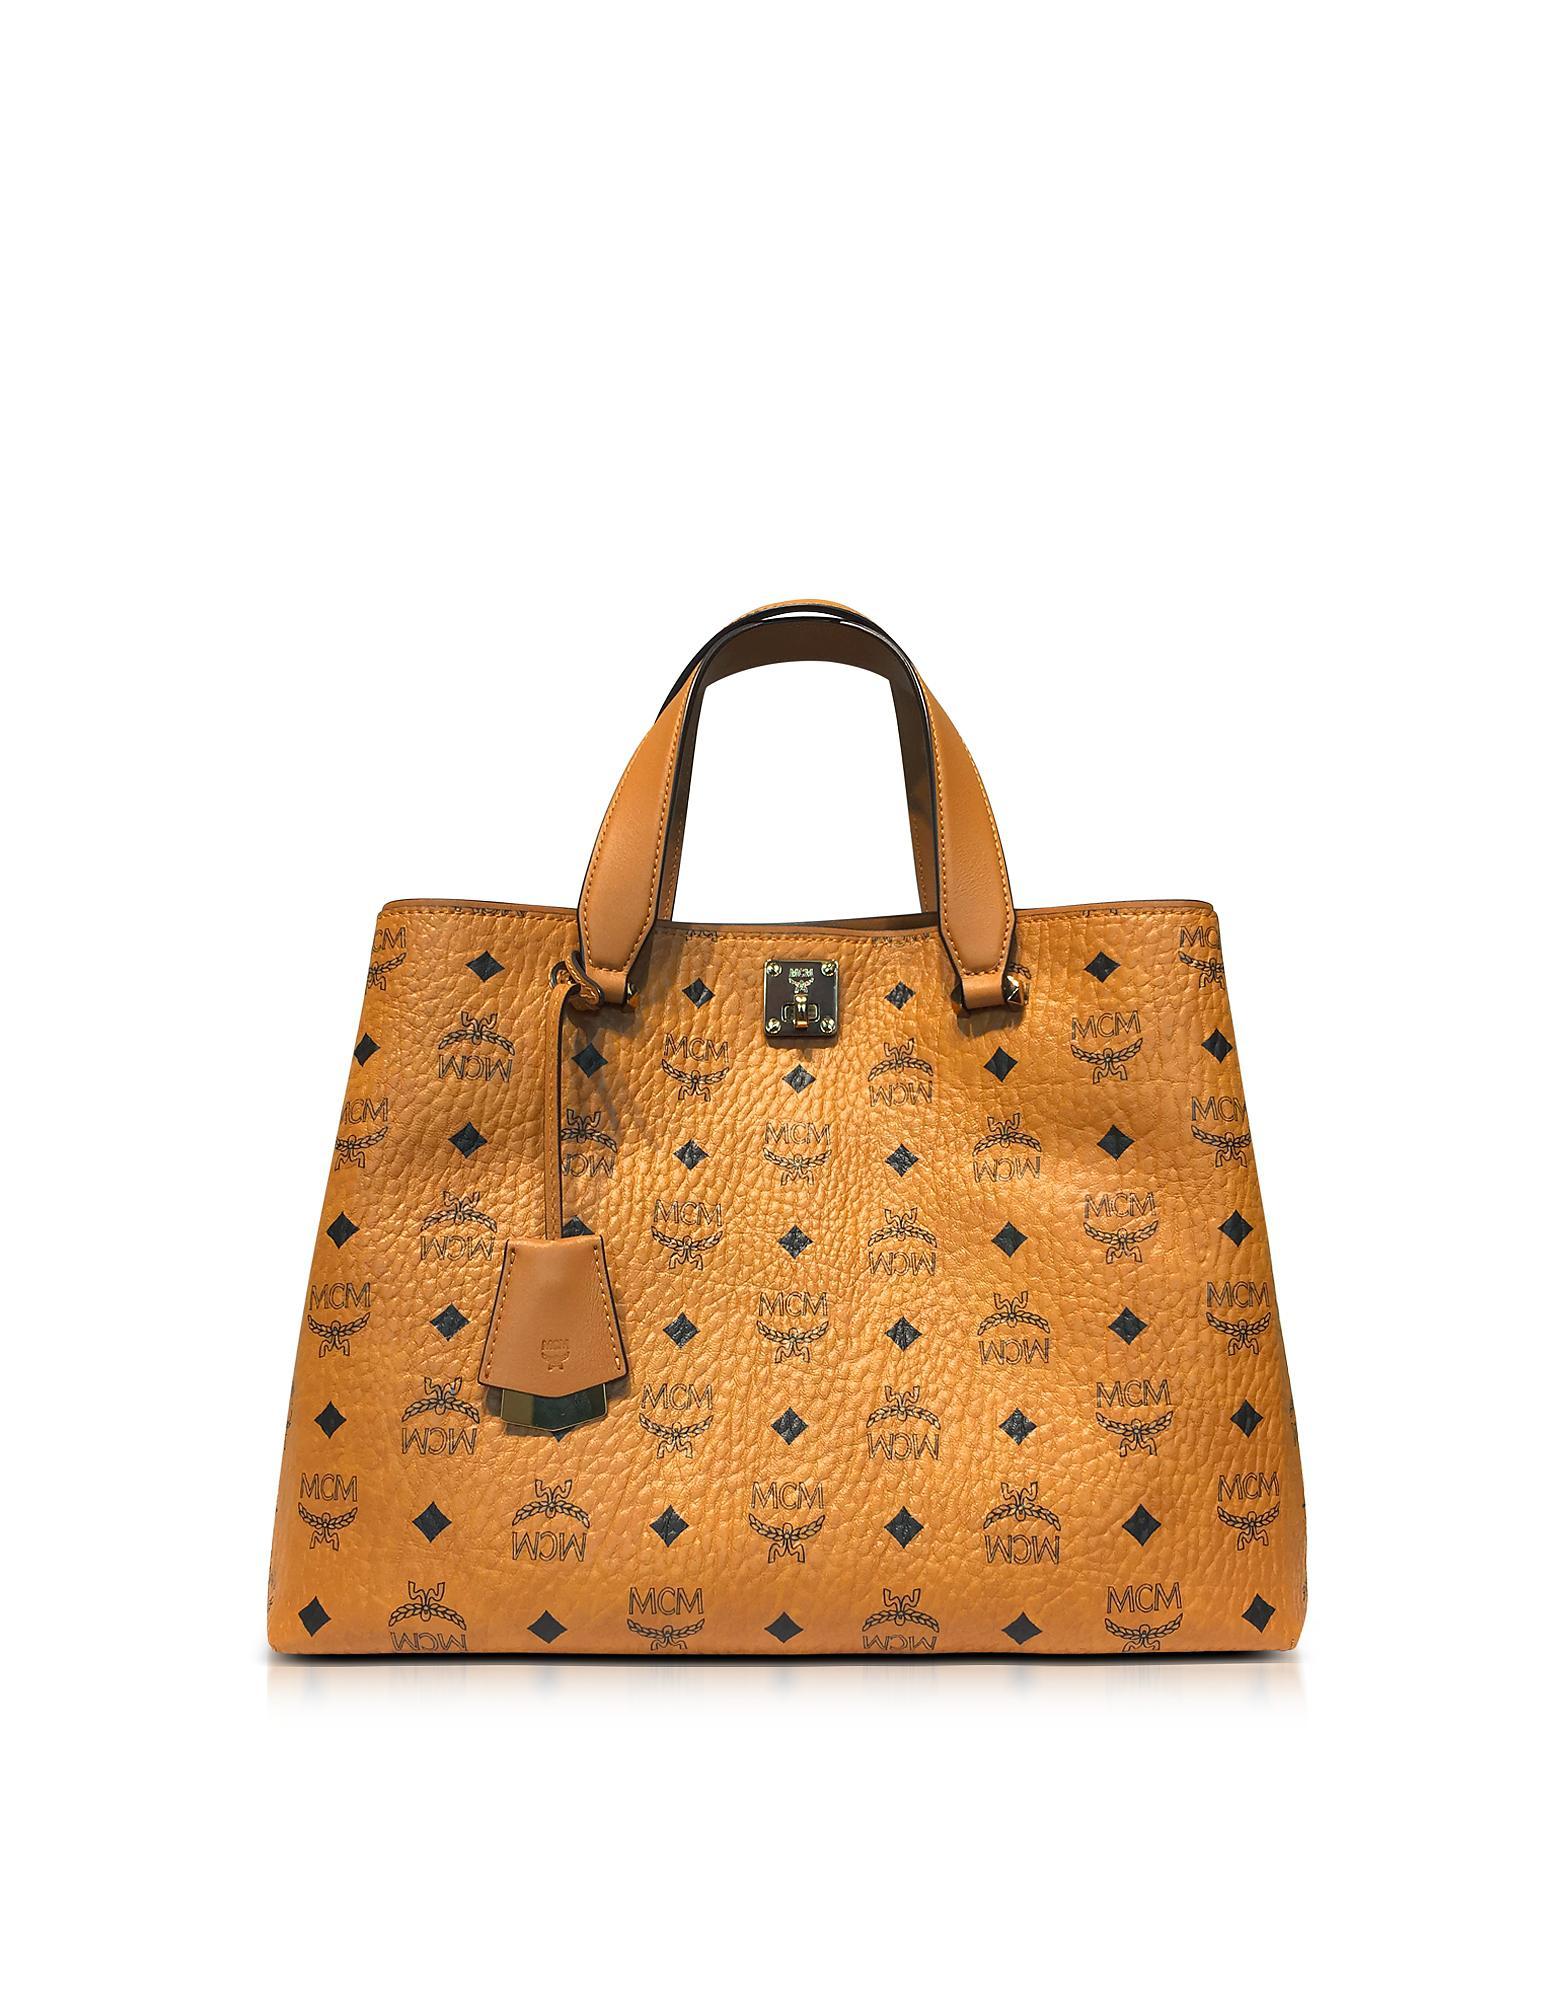 Mcm Sac Shopping Avec Patchs Visetos Cognac BvUhLwF8D